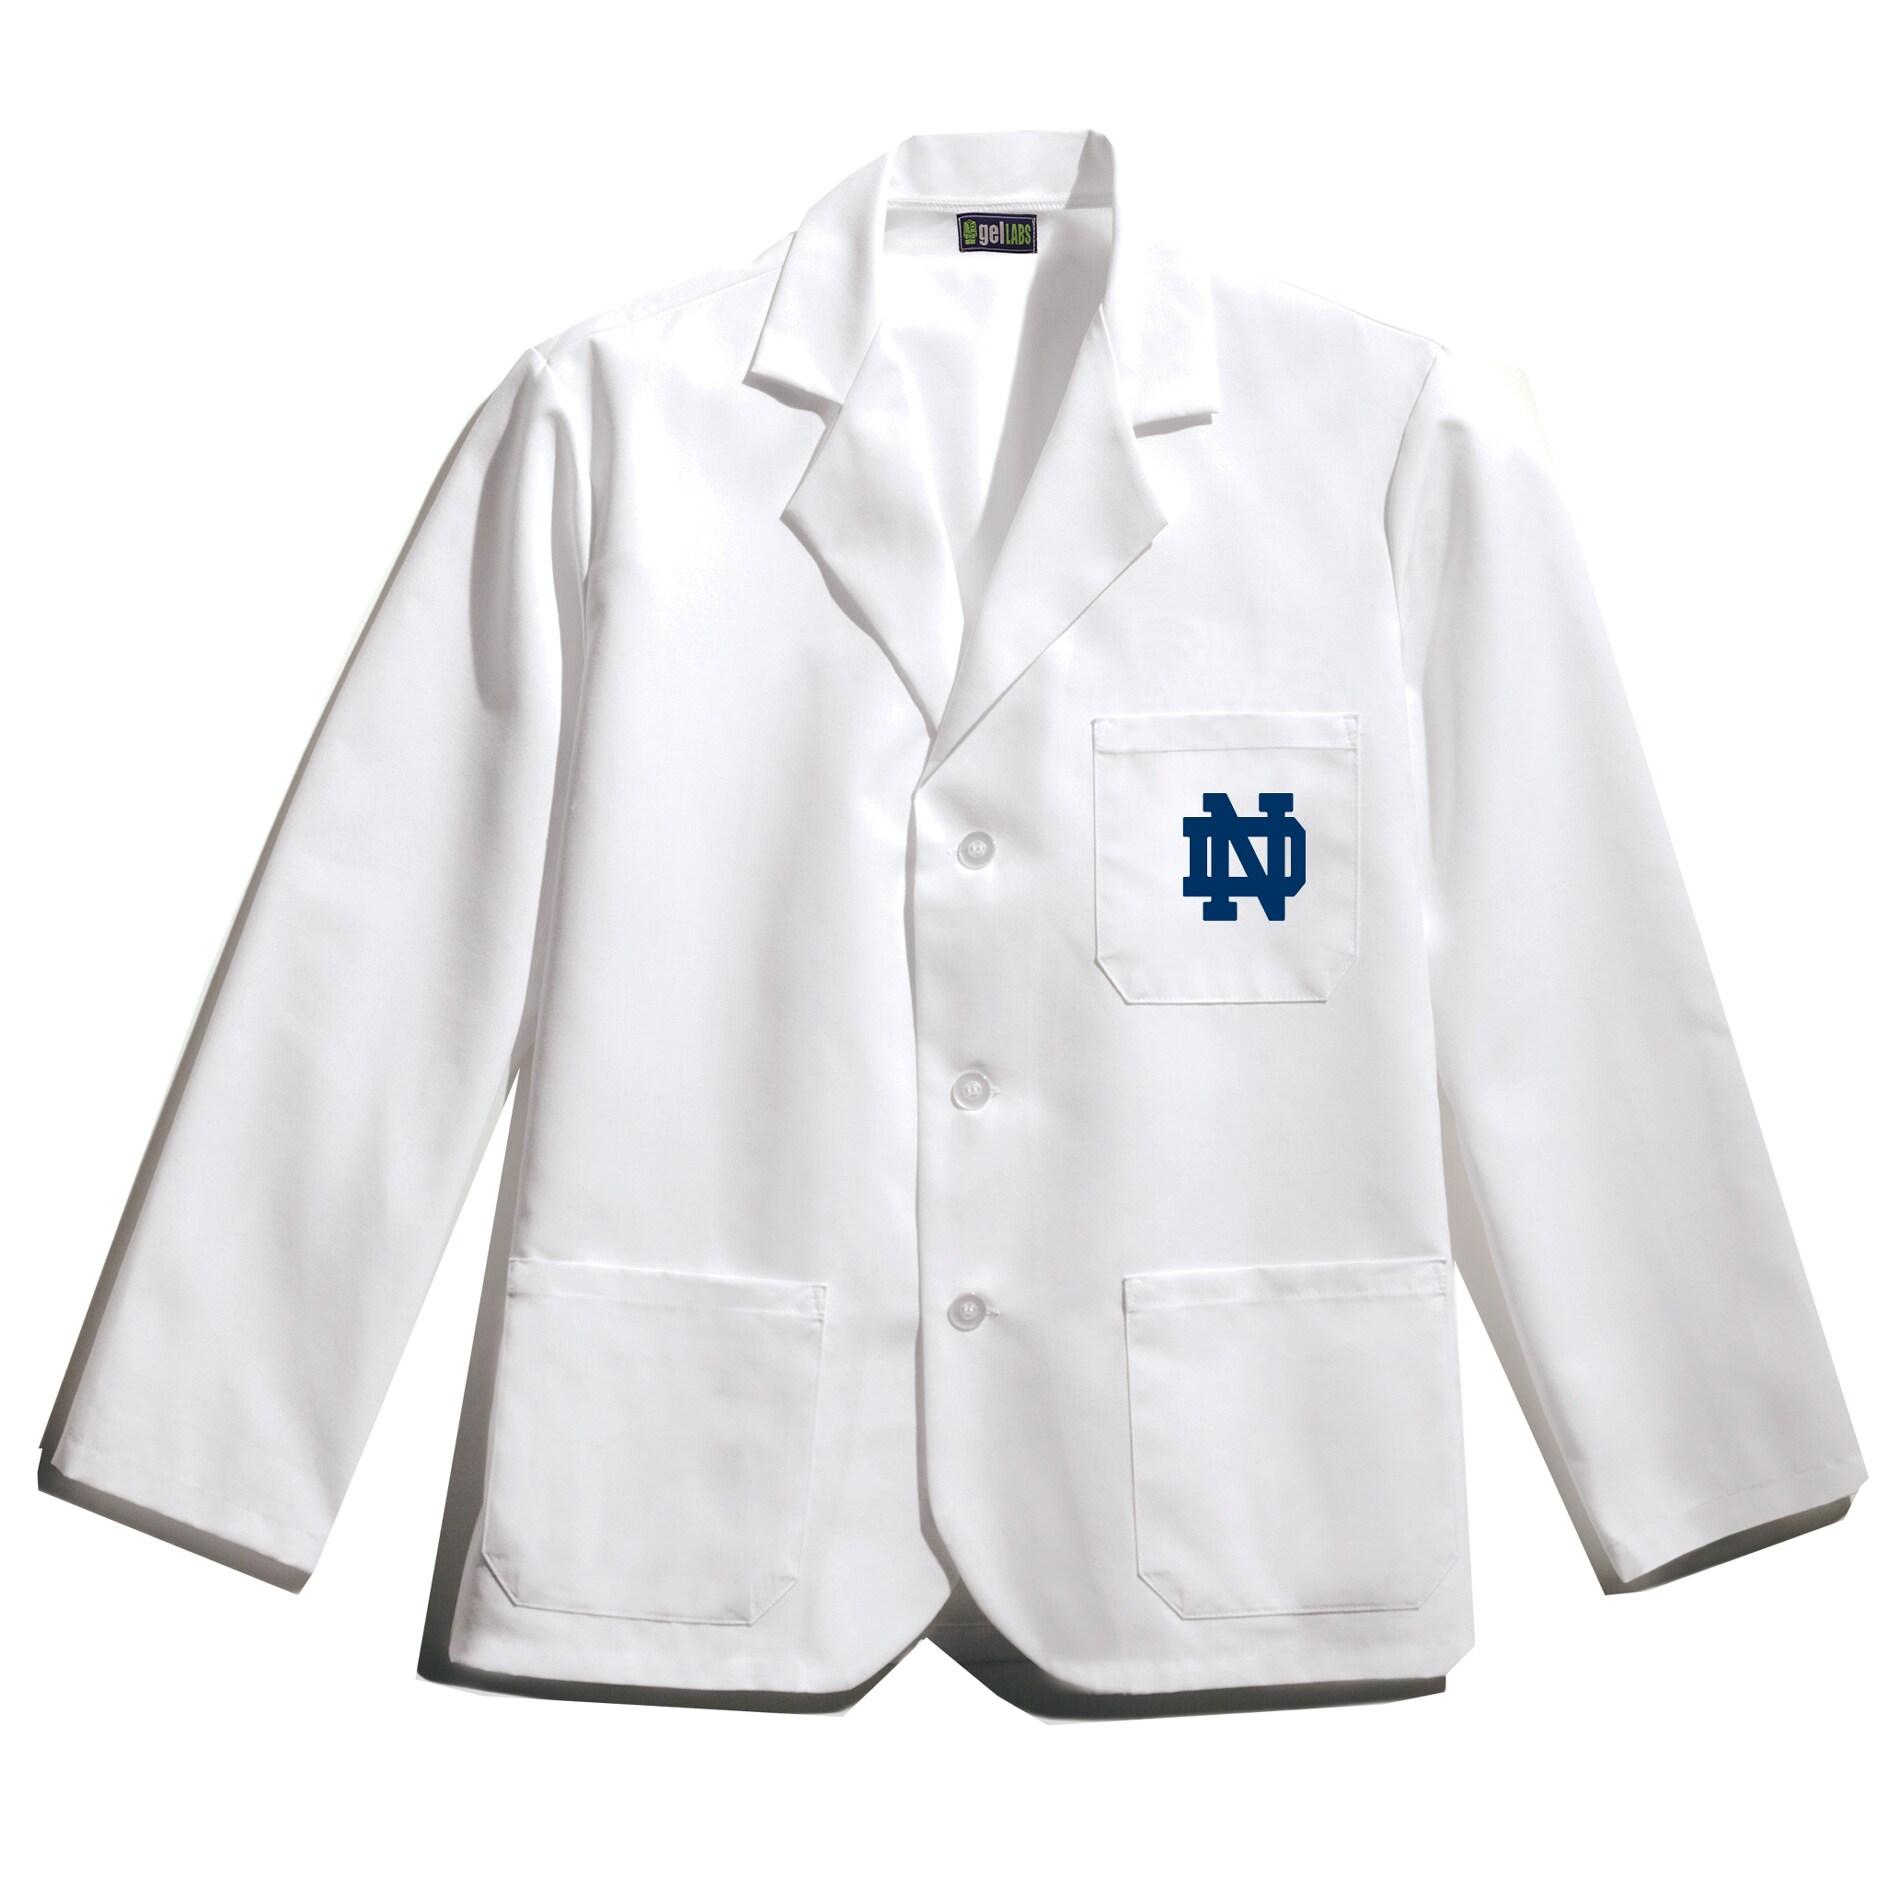 Gelscrubs Unisex NCAA Notre Dame Fighting Irish Wrinkle-Free Short Labcoat